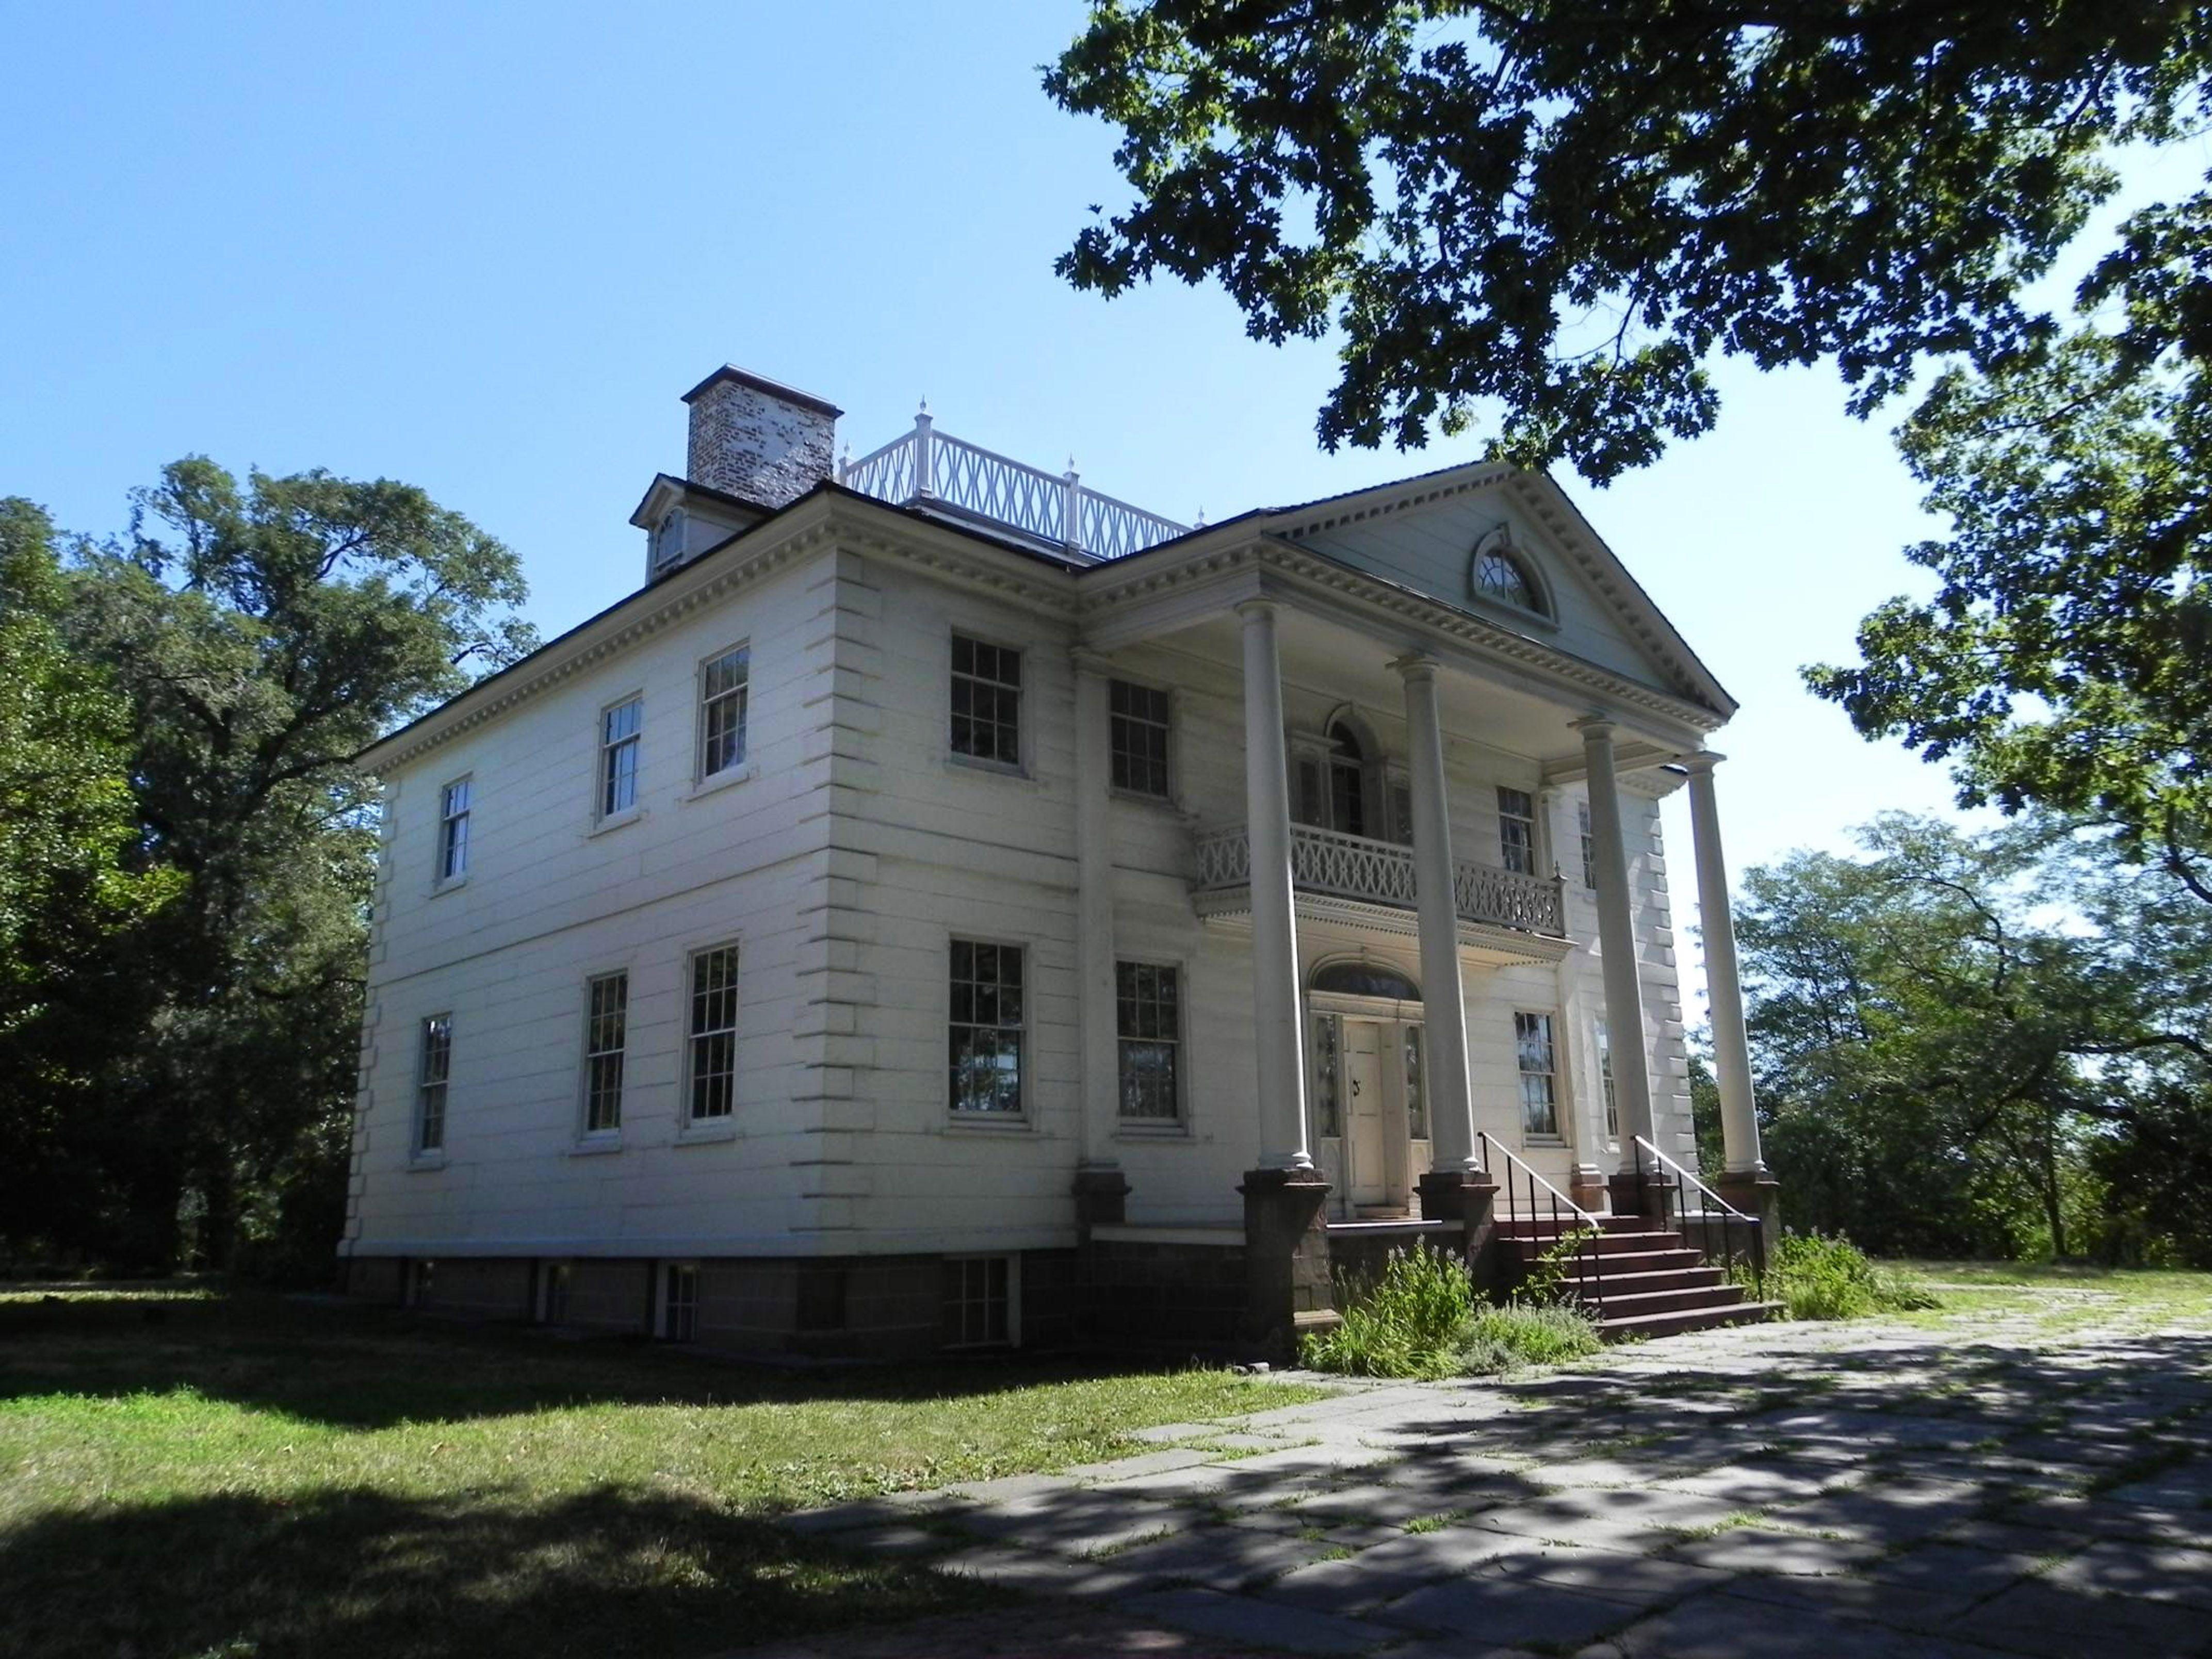 Morris-Jumel Mansion New York